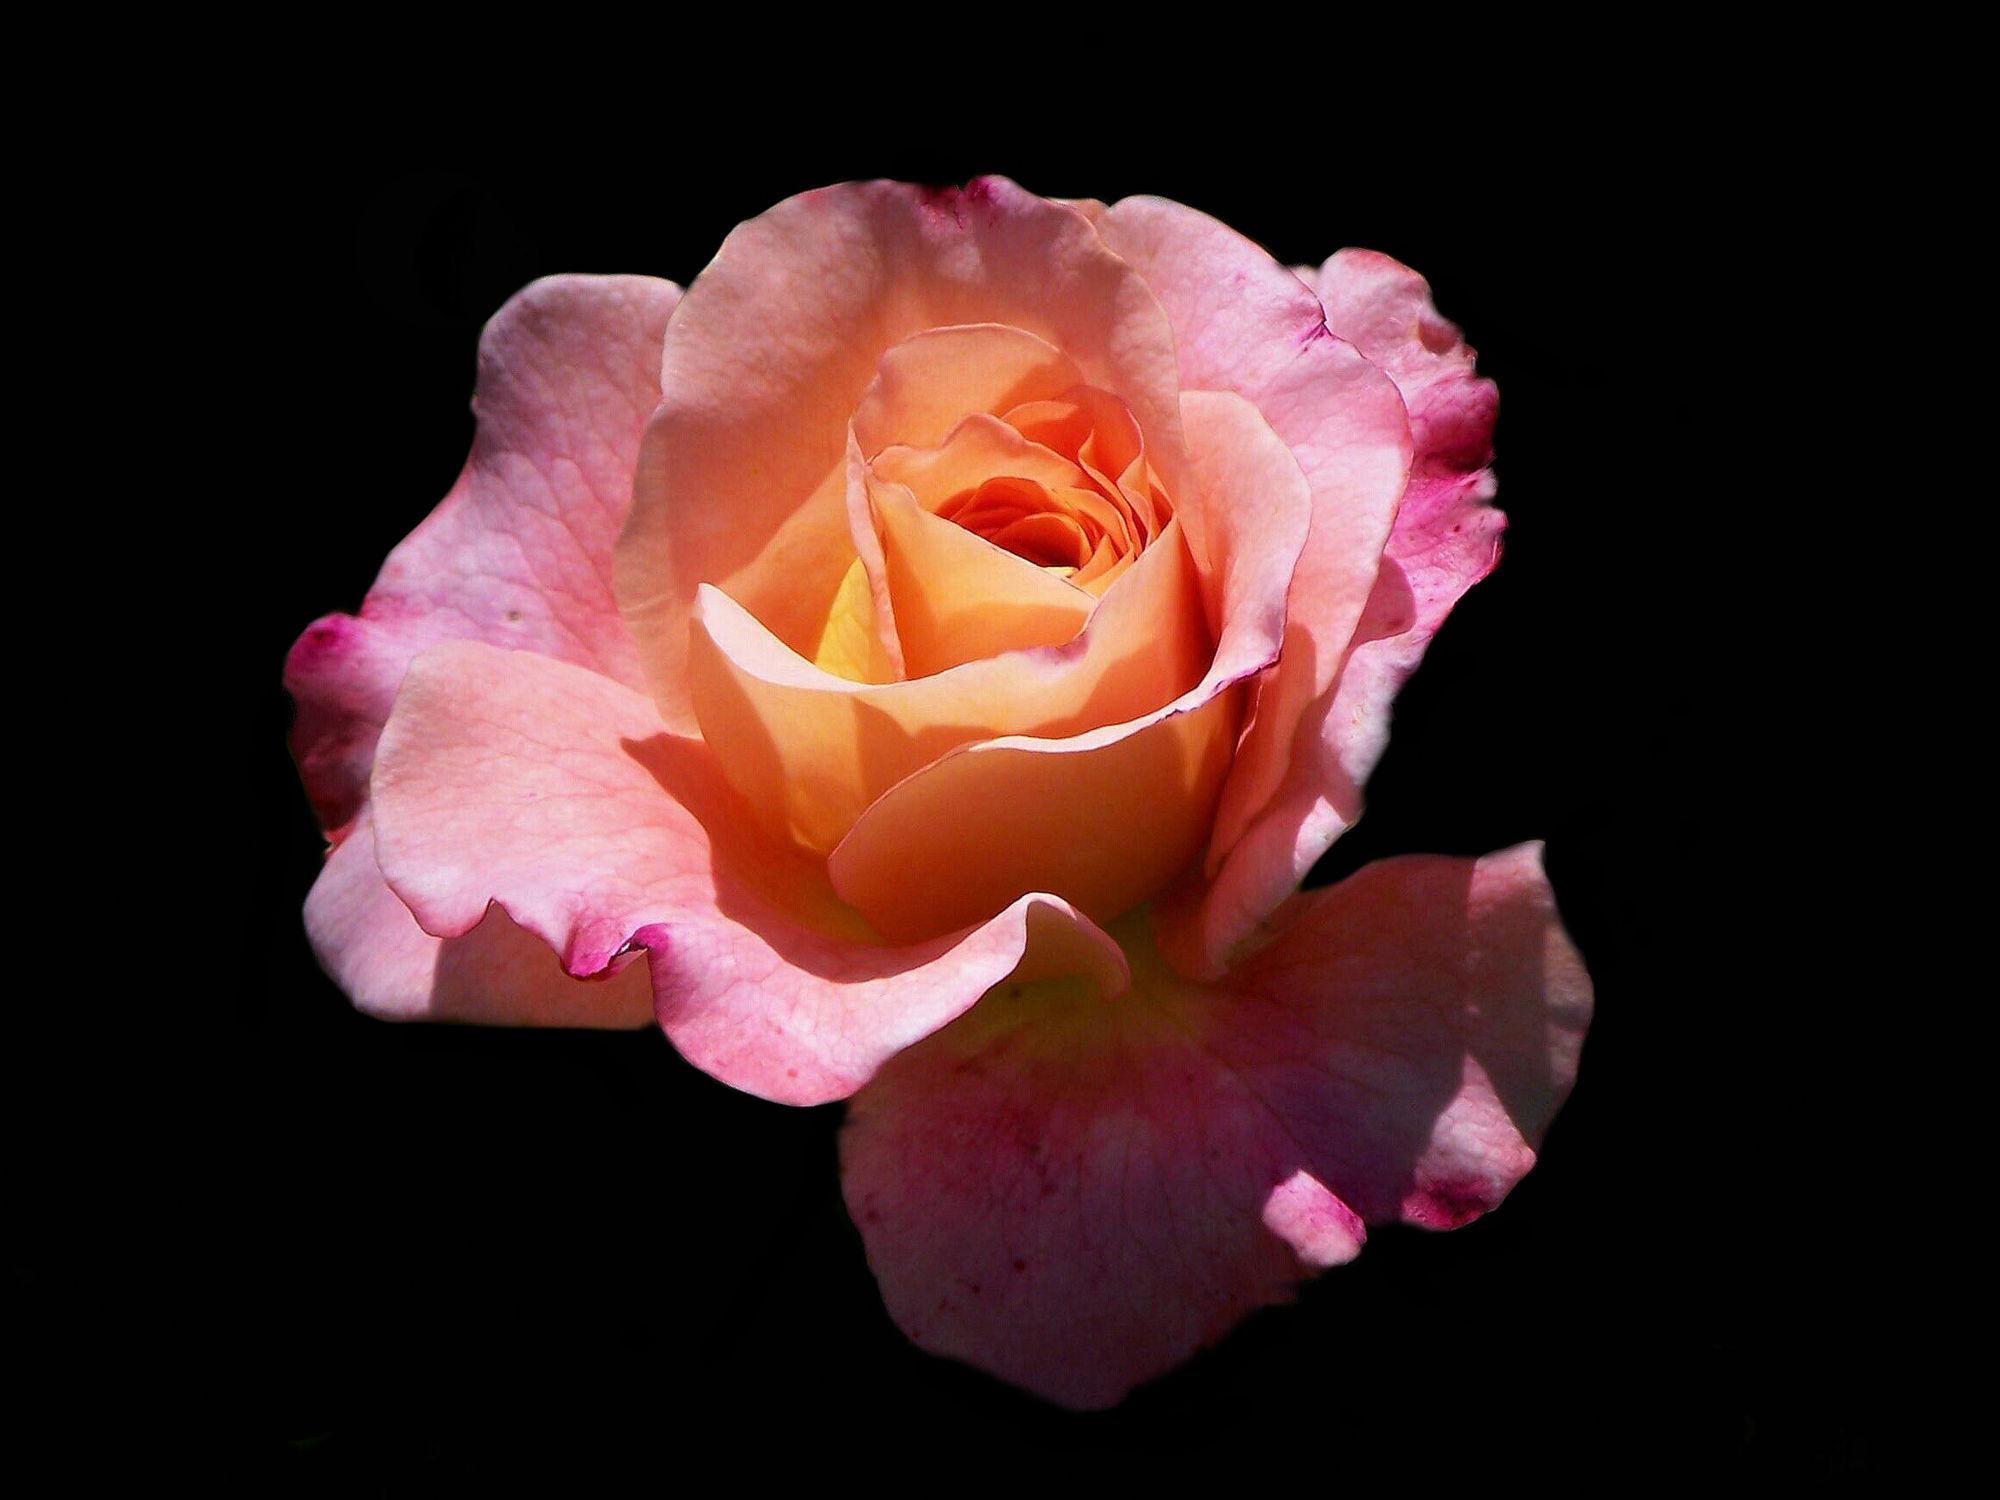 Bild mit Natur, Pflanzen, Rosen, Pflanze, Rose, romantik, Blüten, blüte, Liebe, Knospe, Knospen